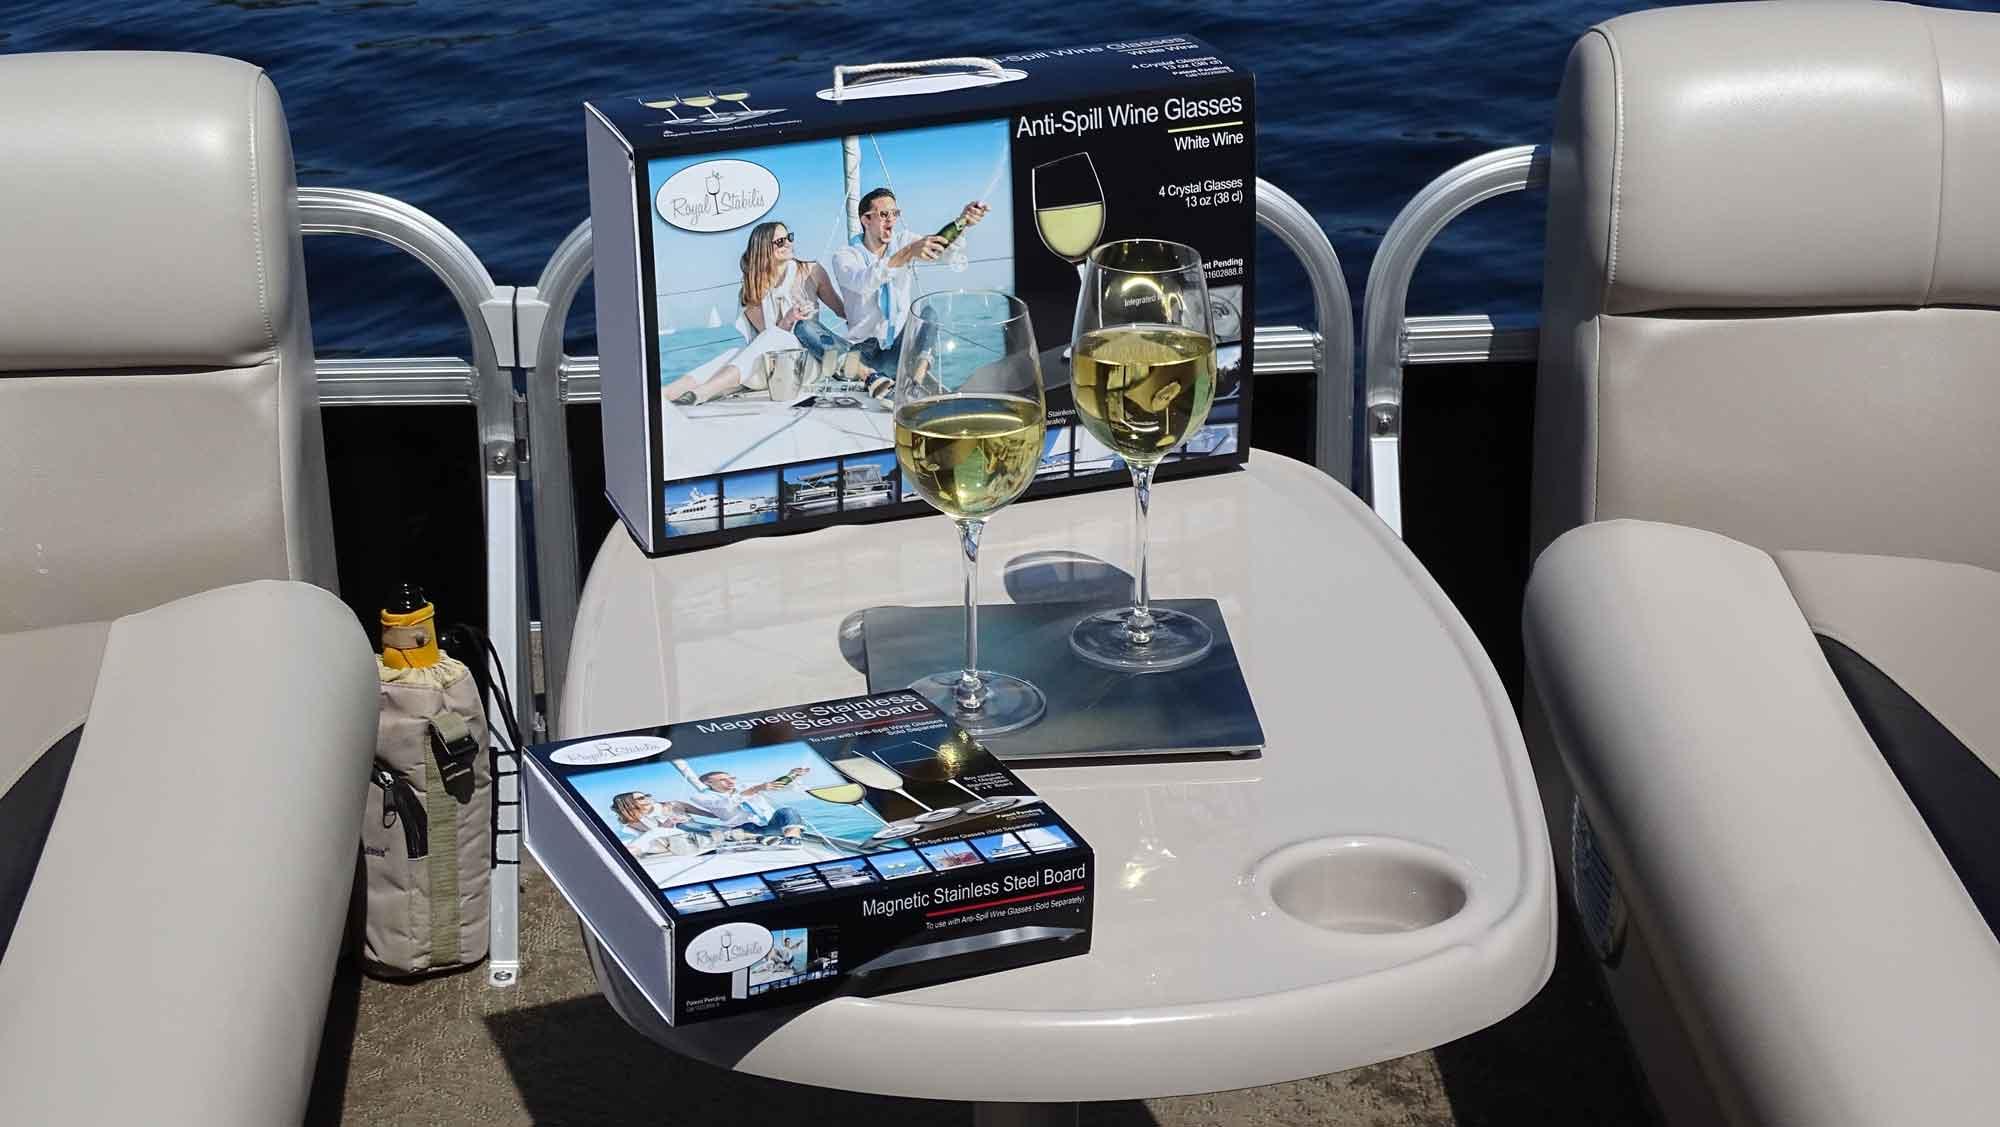 royal stabilis wine glass system